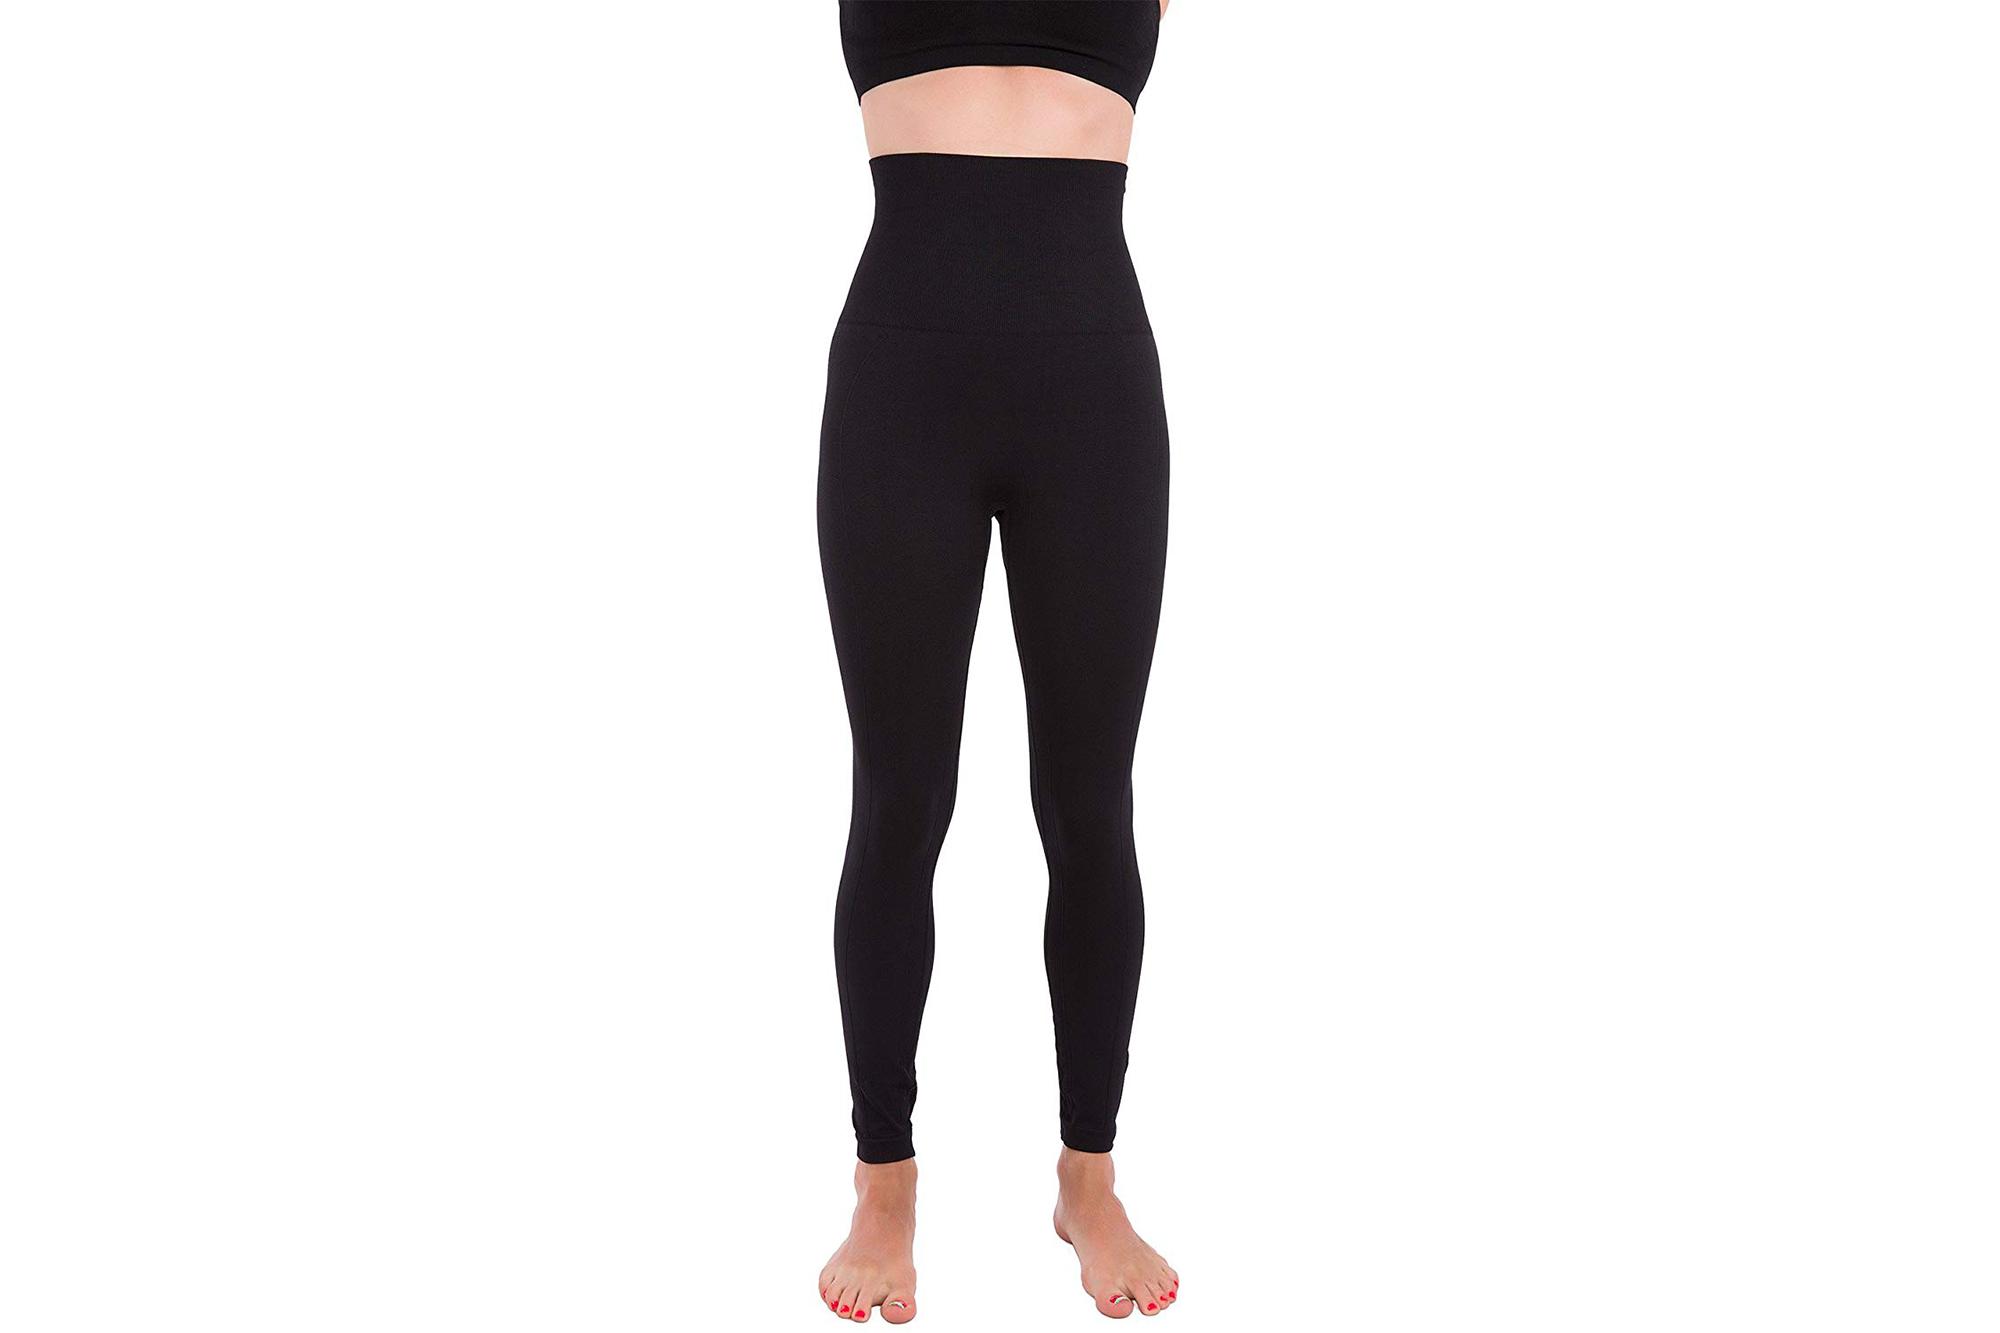 Homma Premium Slimming Leggings Are Like 'Magic'